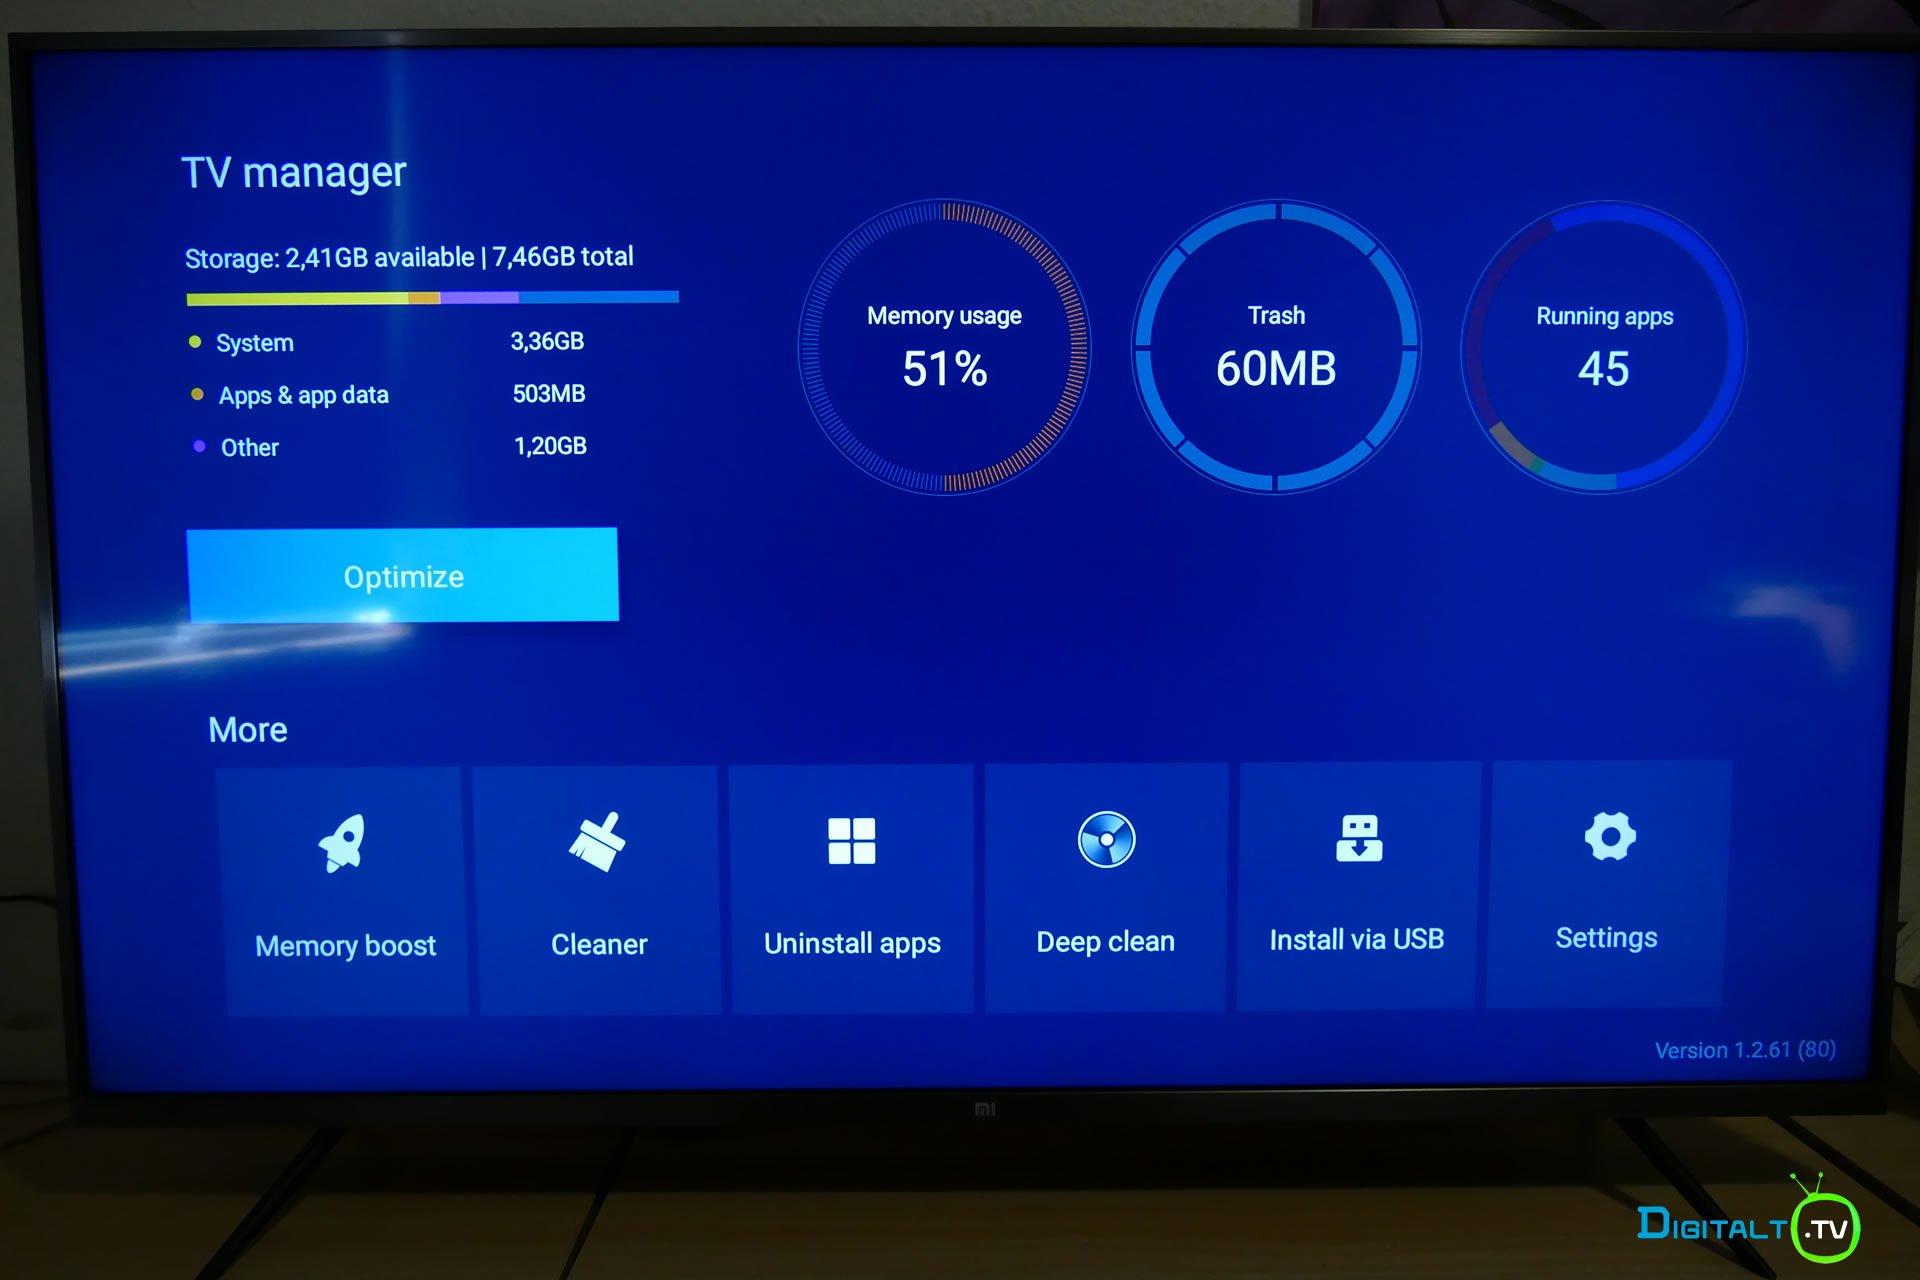 Xiaomi Mi LED TV 4S Manager